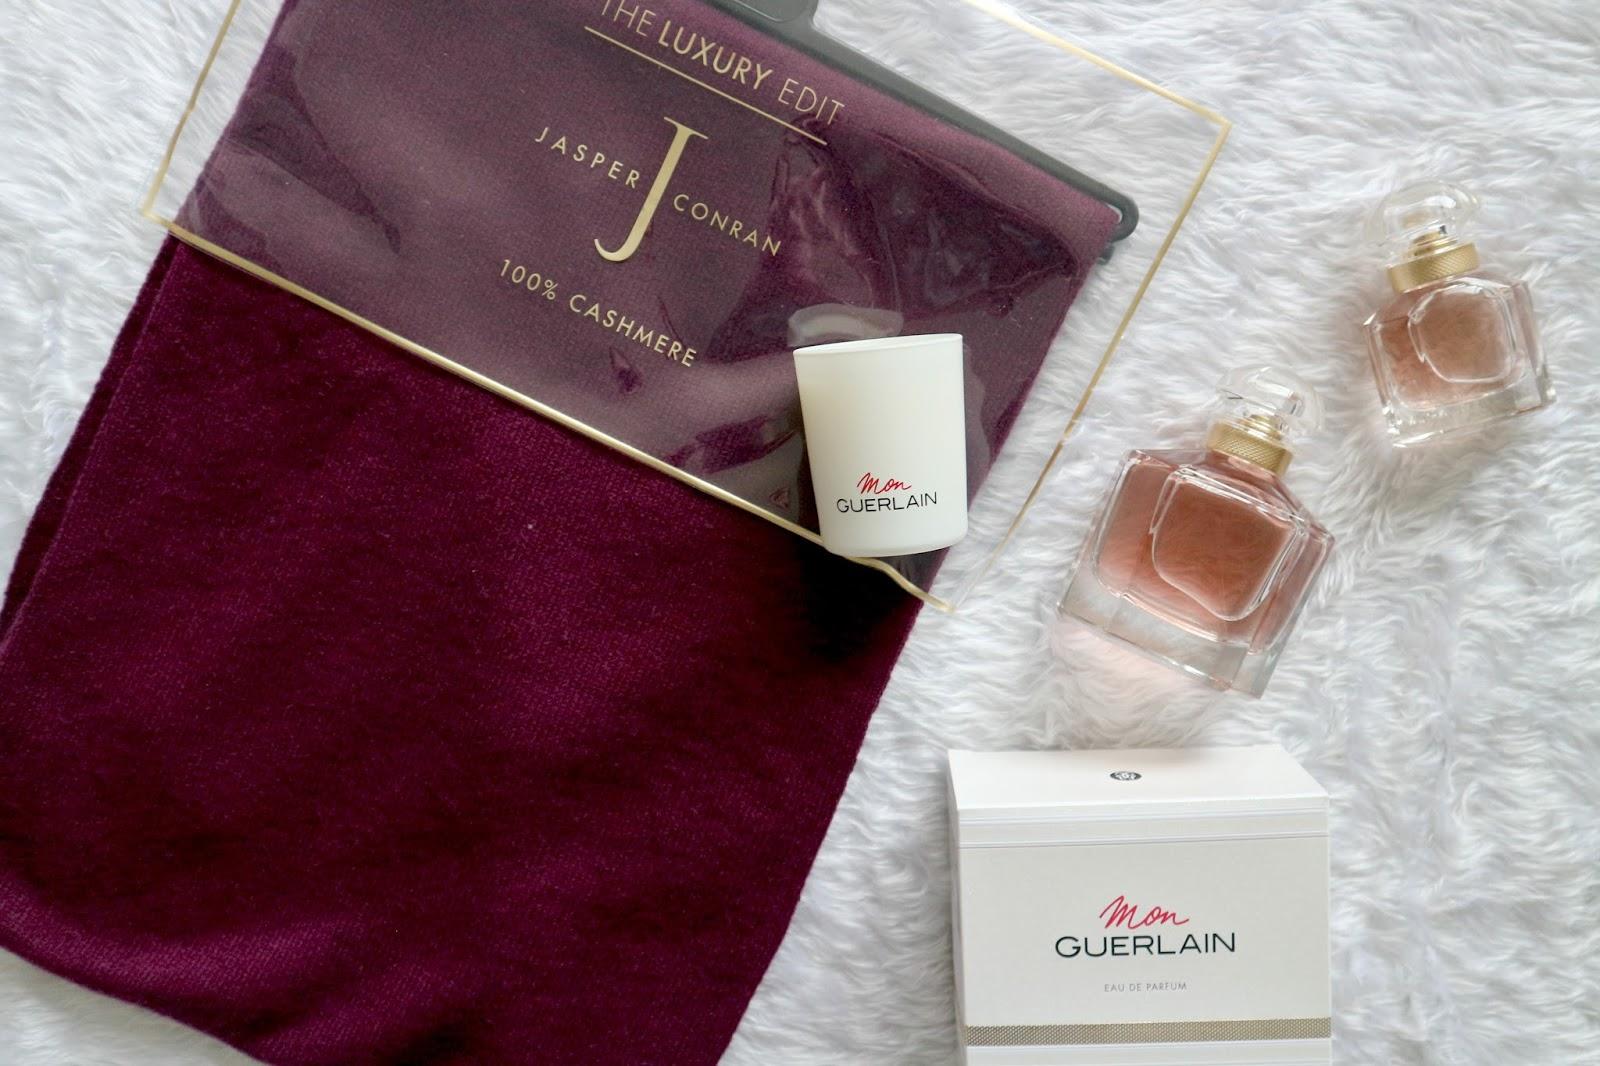 mon guerlain review